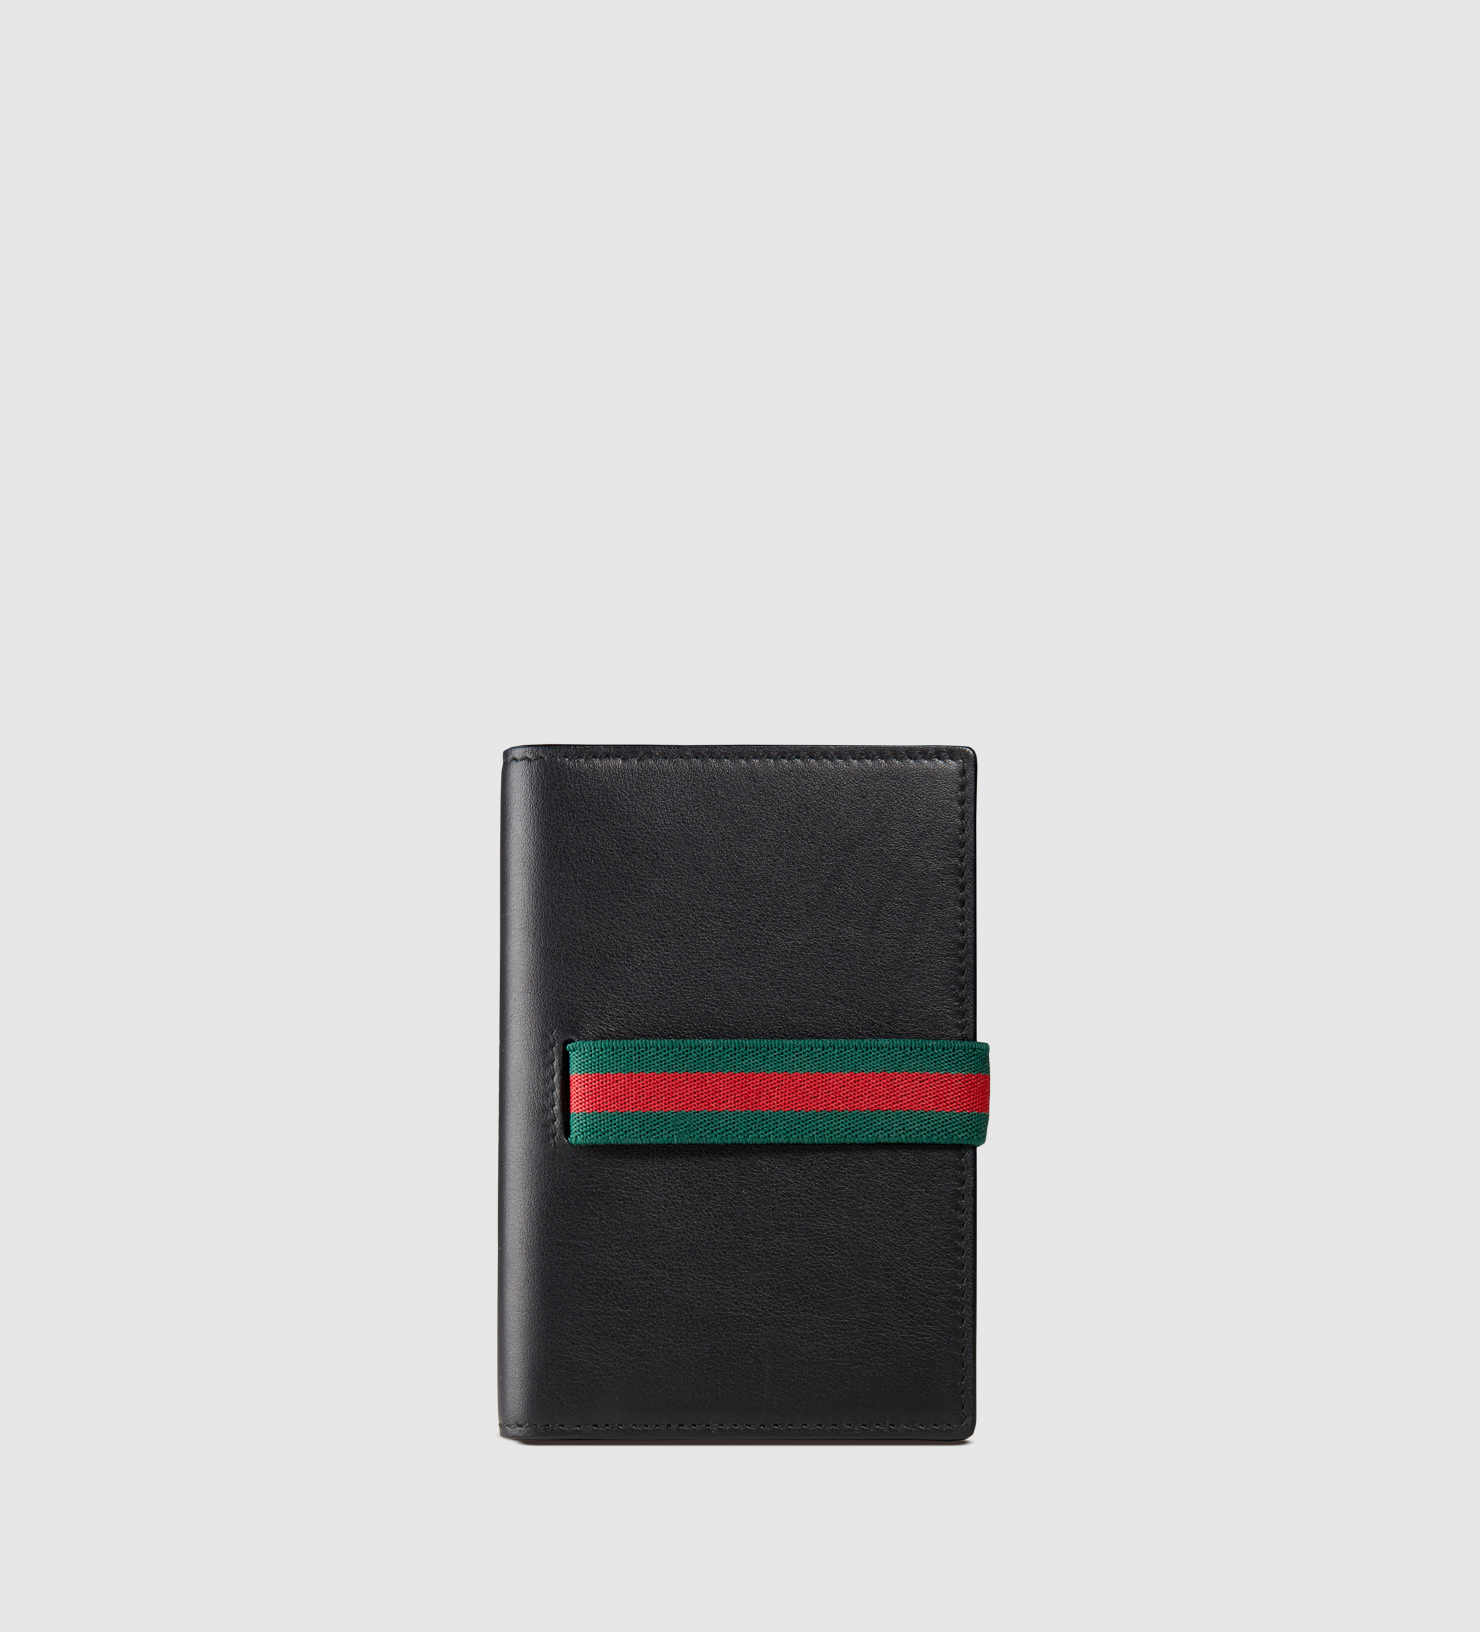 Prada Passport Cover